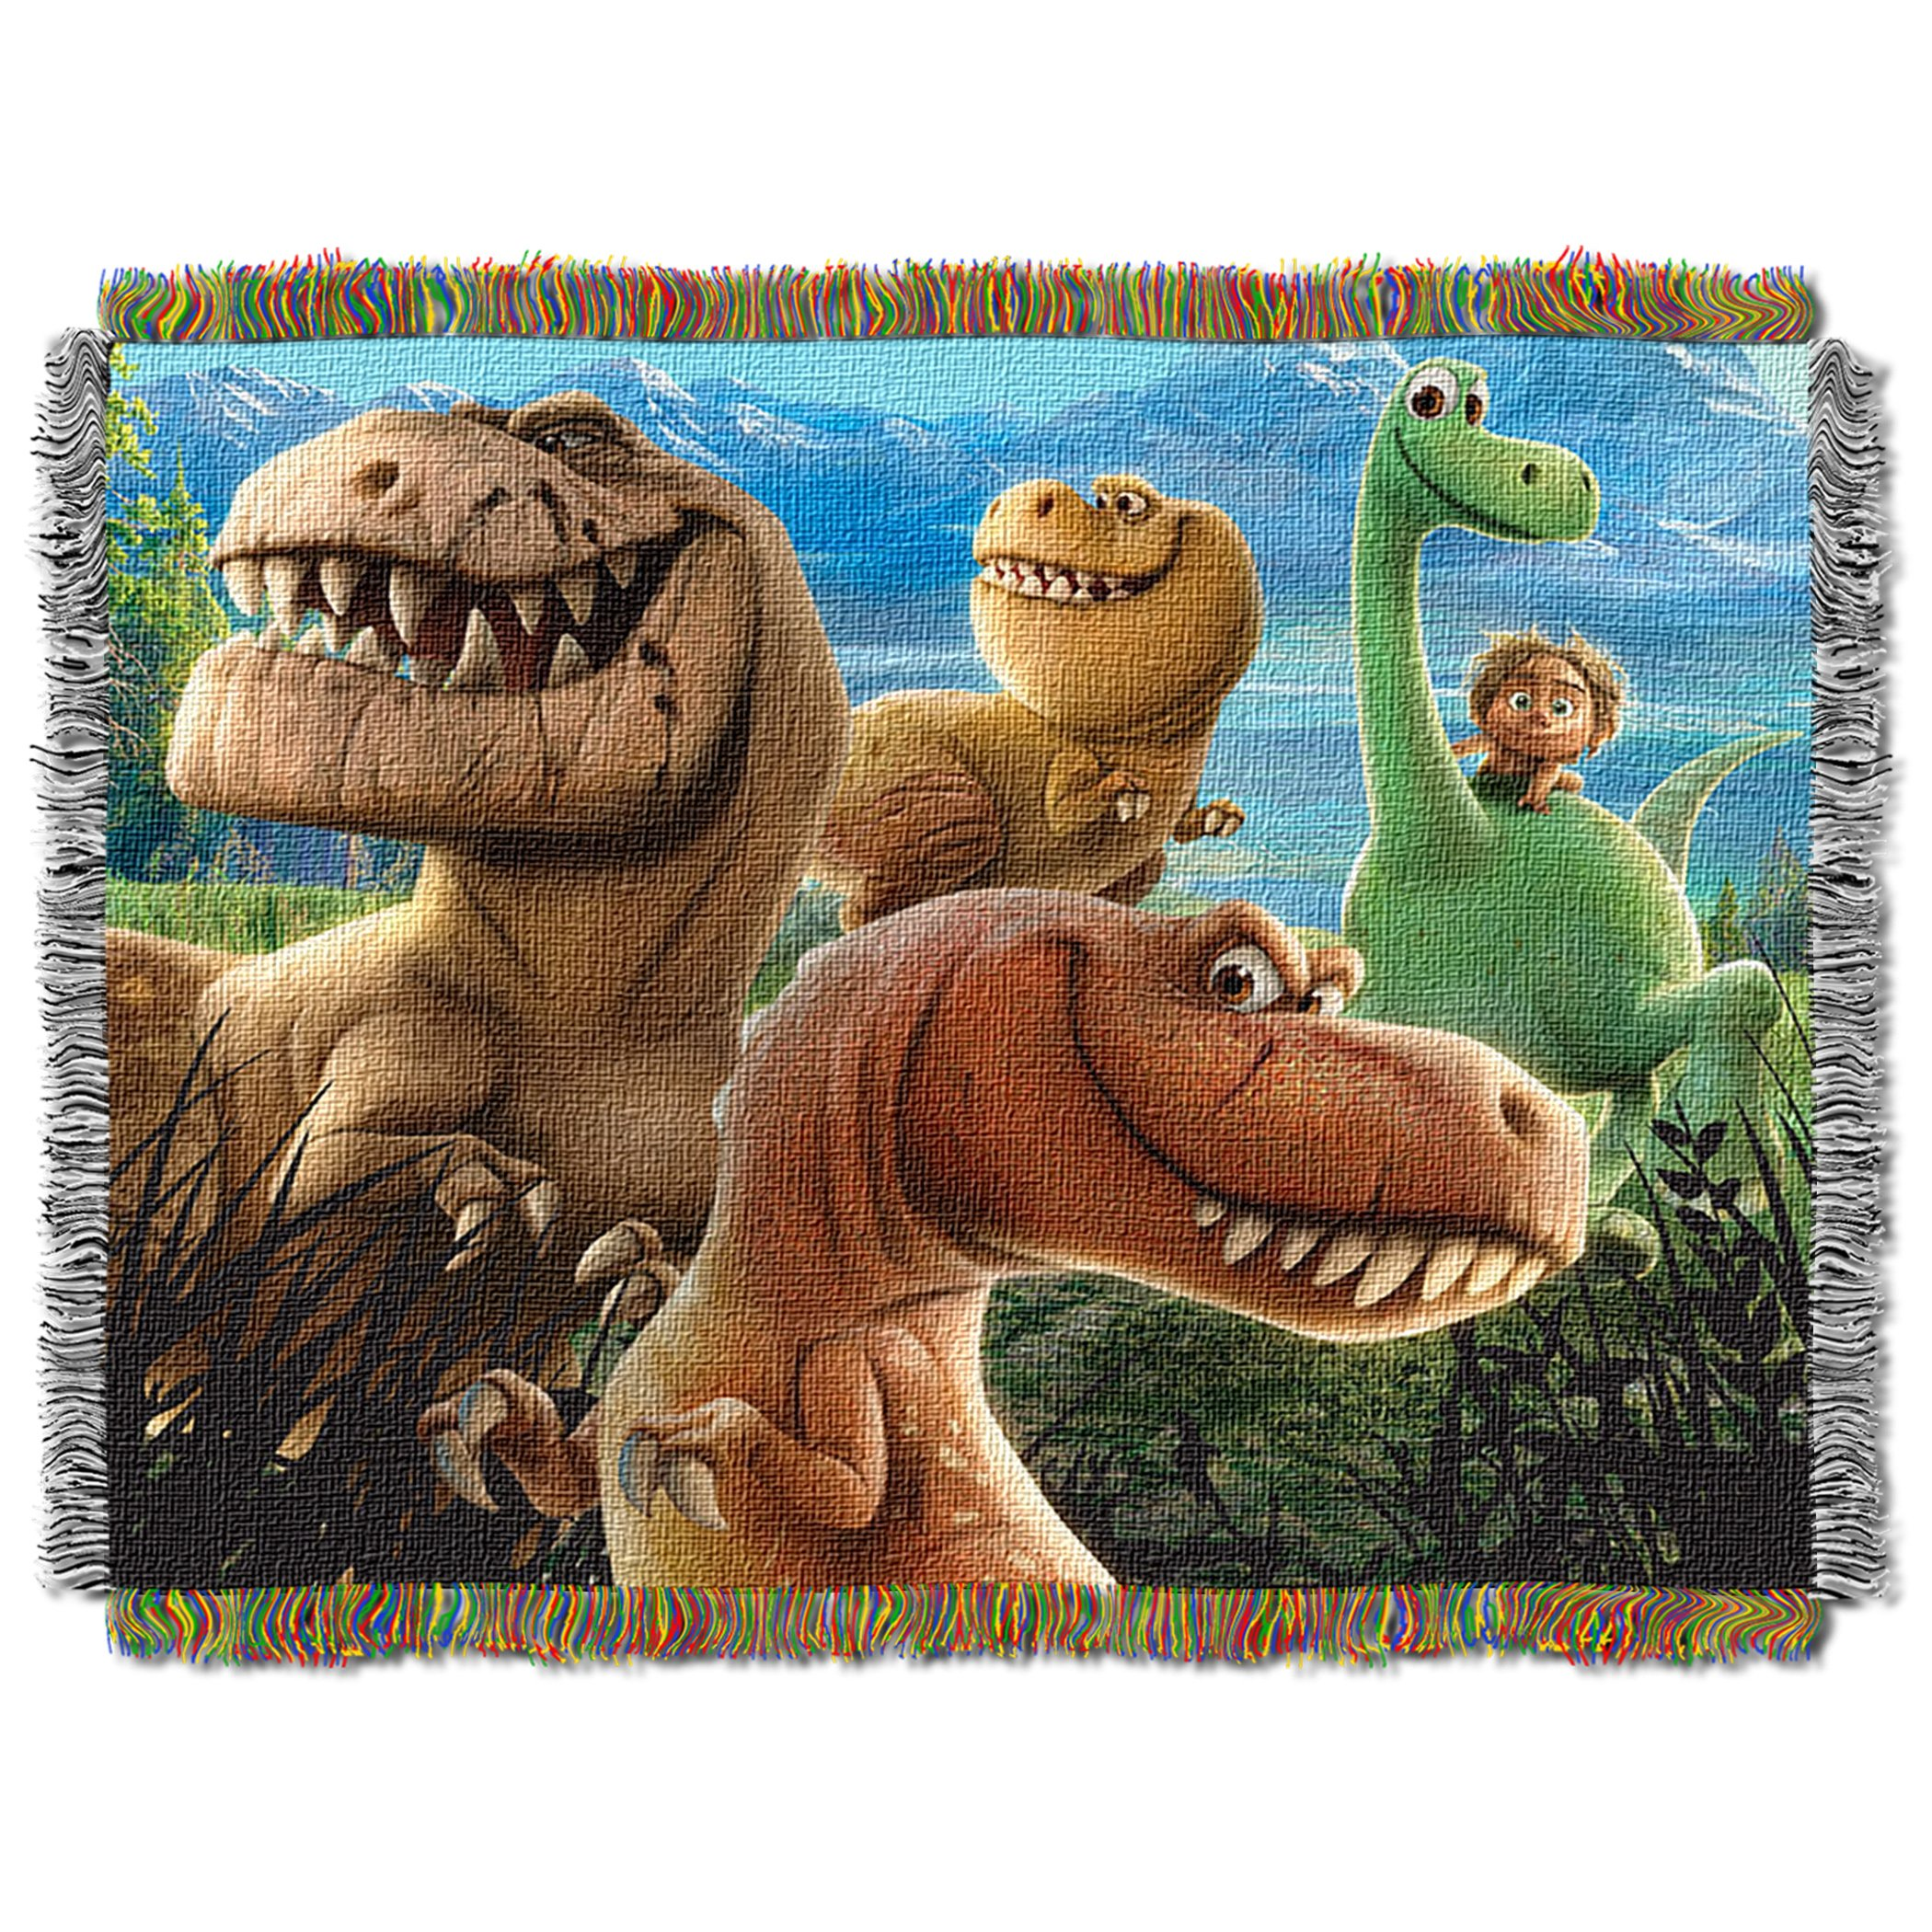 Disney's The Good Dinosaur, ''Dino Mash'' Woven Tapestry Throw Blanket, 48'' x 60, Multi Color by Disney Pixar